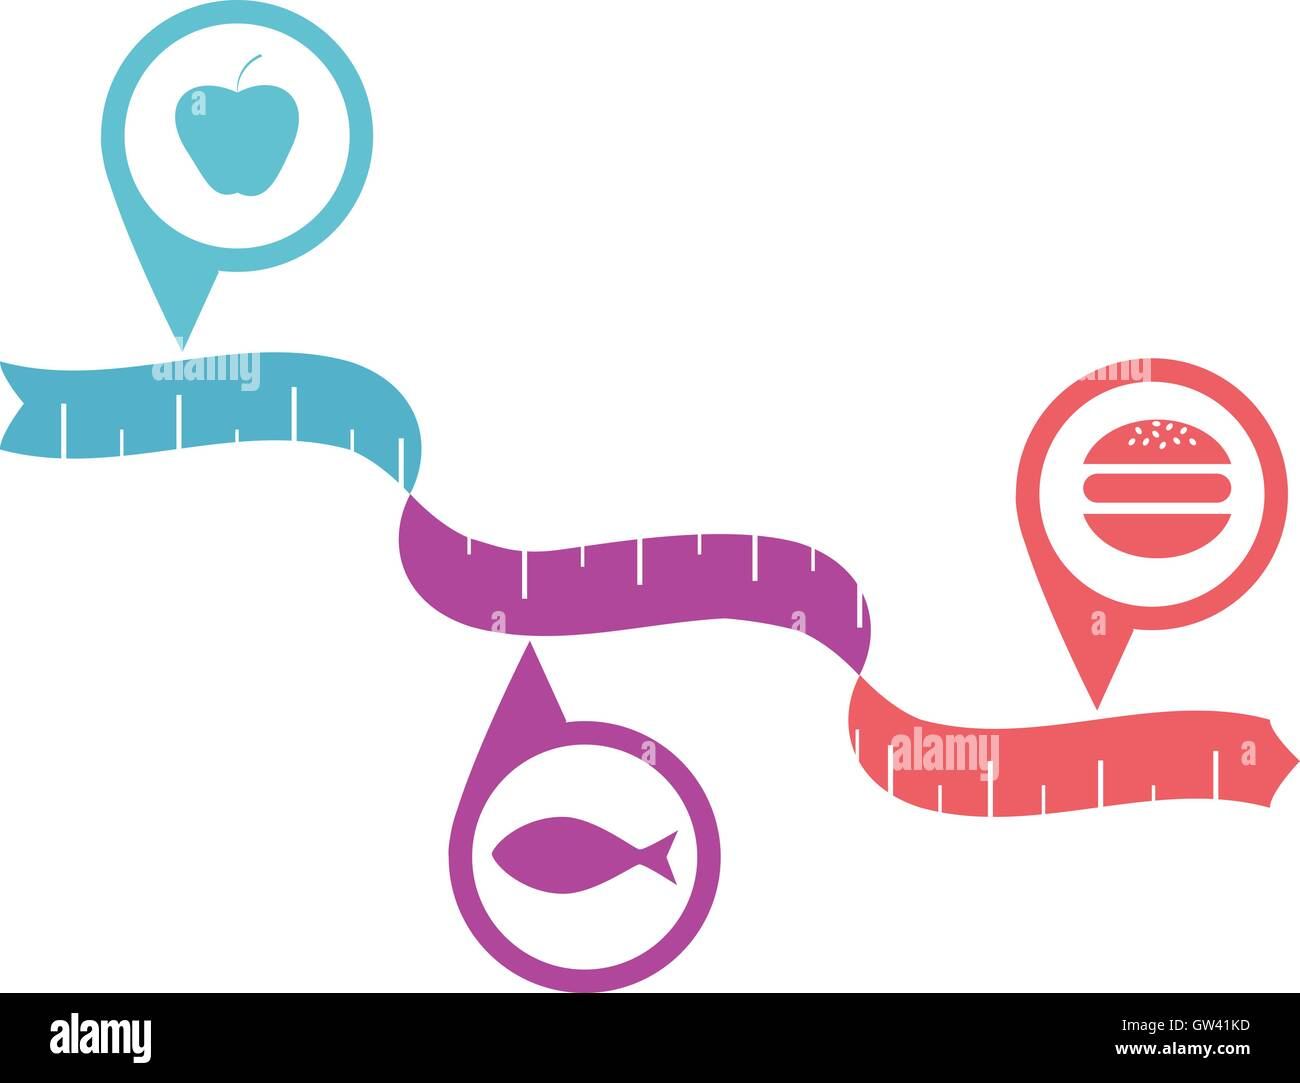 Healhty diet concept - Stock Image